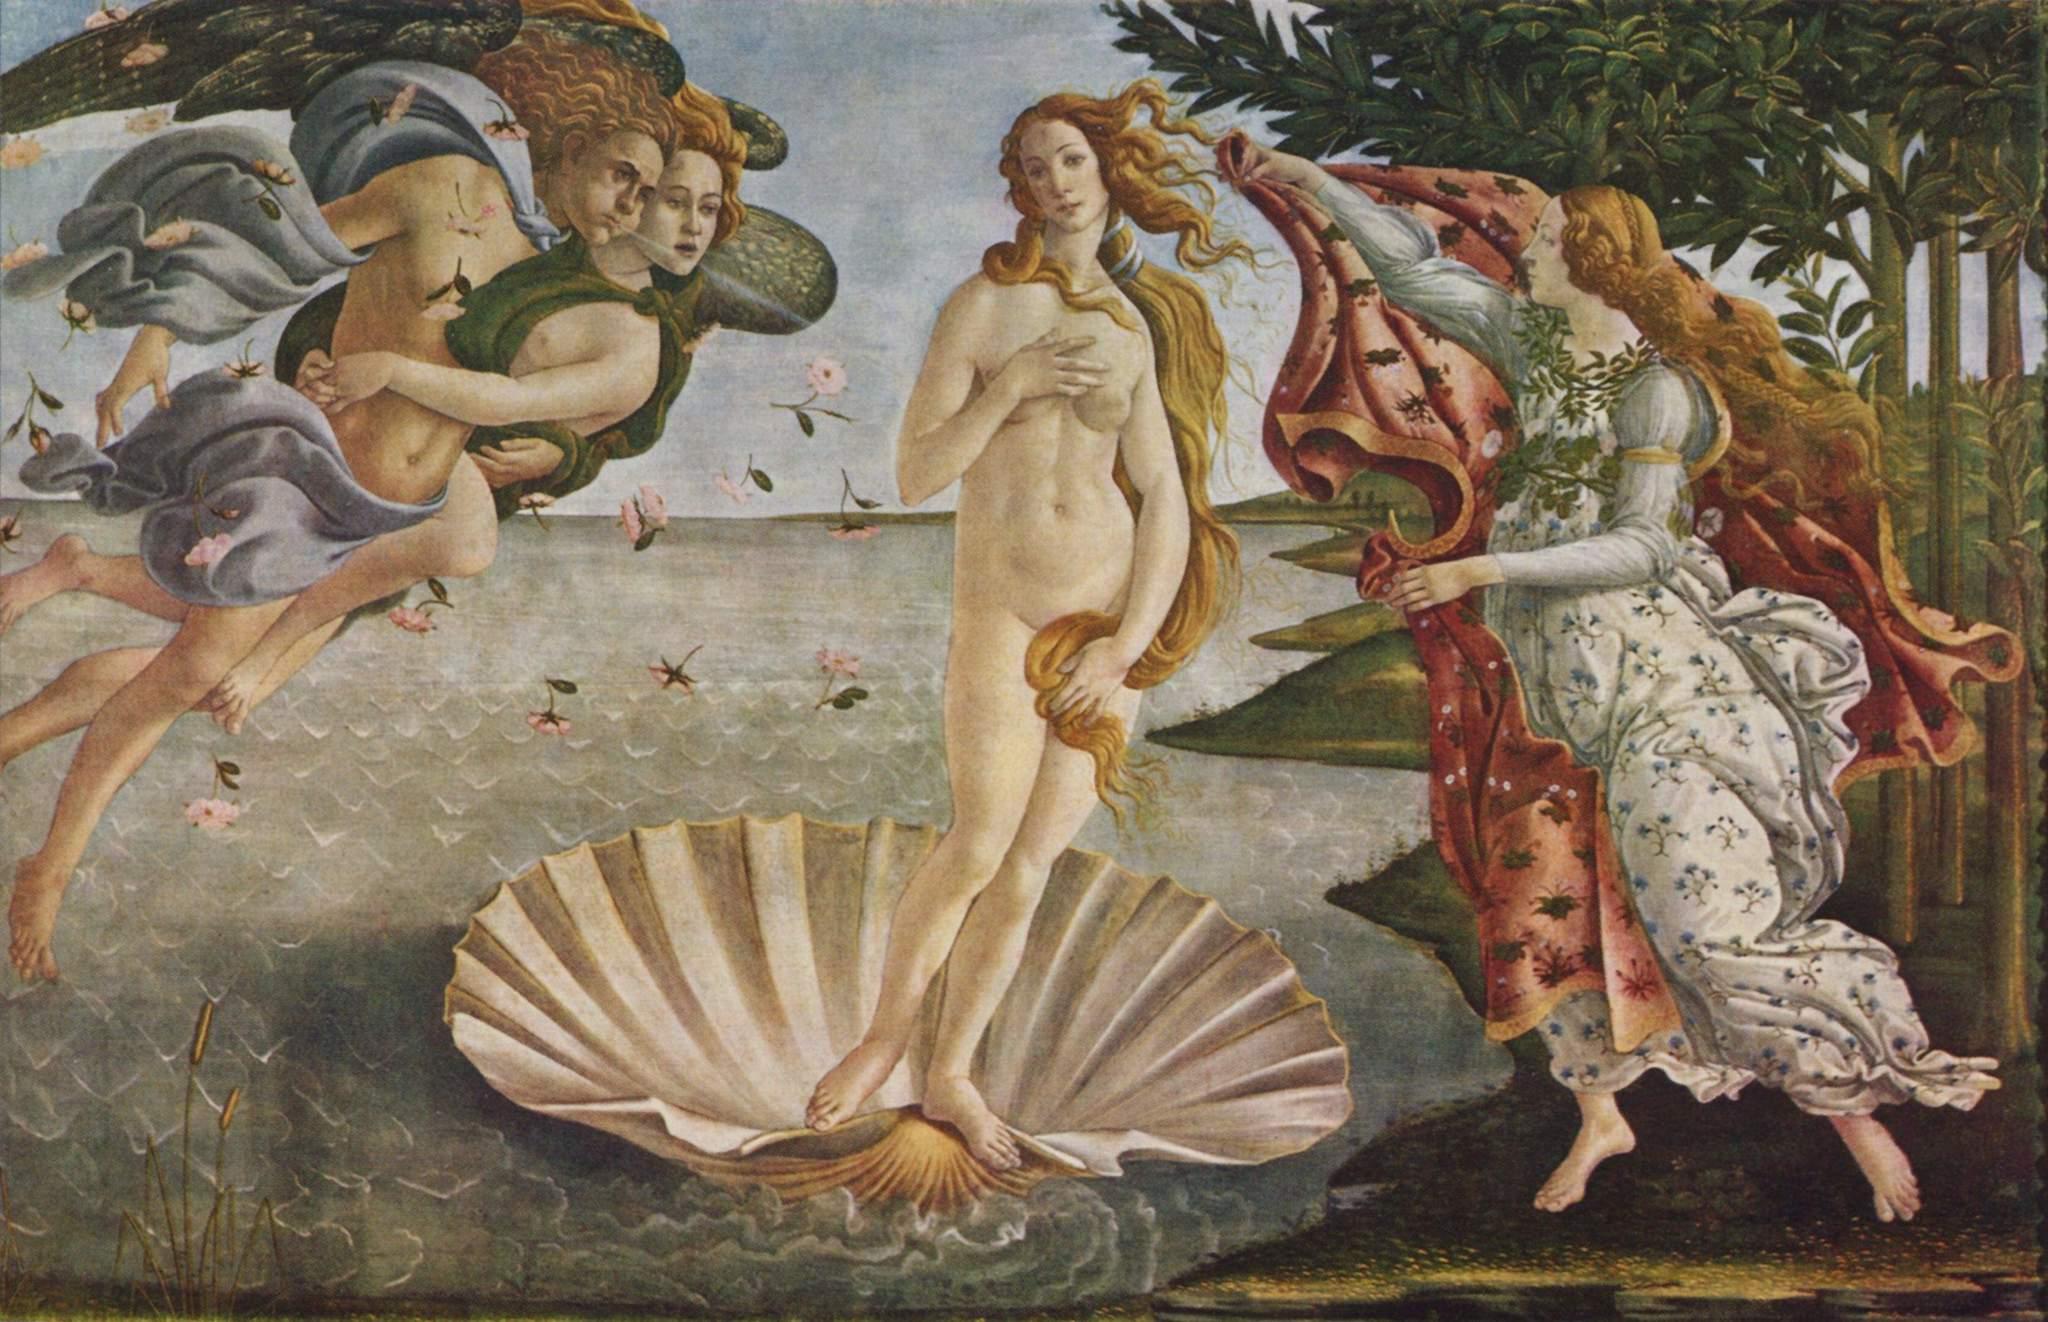 317 Sandro Botticelli 747 Nacimiento De Venus together with Short Tail Tri Color Ryukin Gold Fish additionally Albino Red Oscar Astronotus Ocellatus additionally Marlin also Jennifer Hudson MTV Photo Gallery. on oscar fish origin